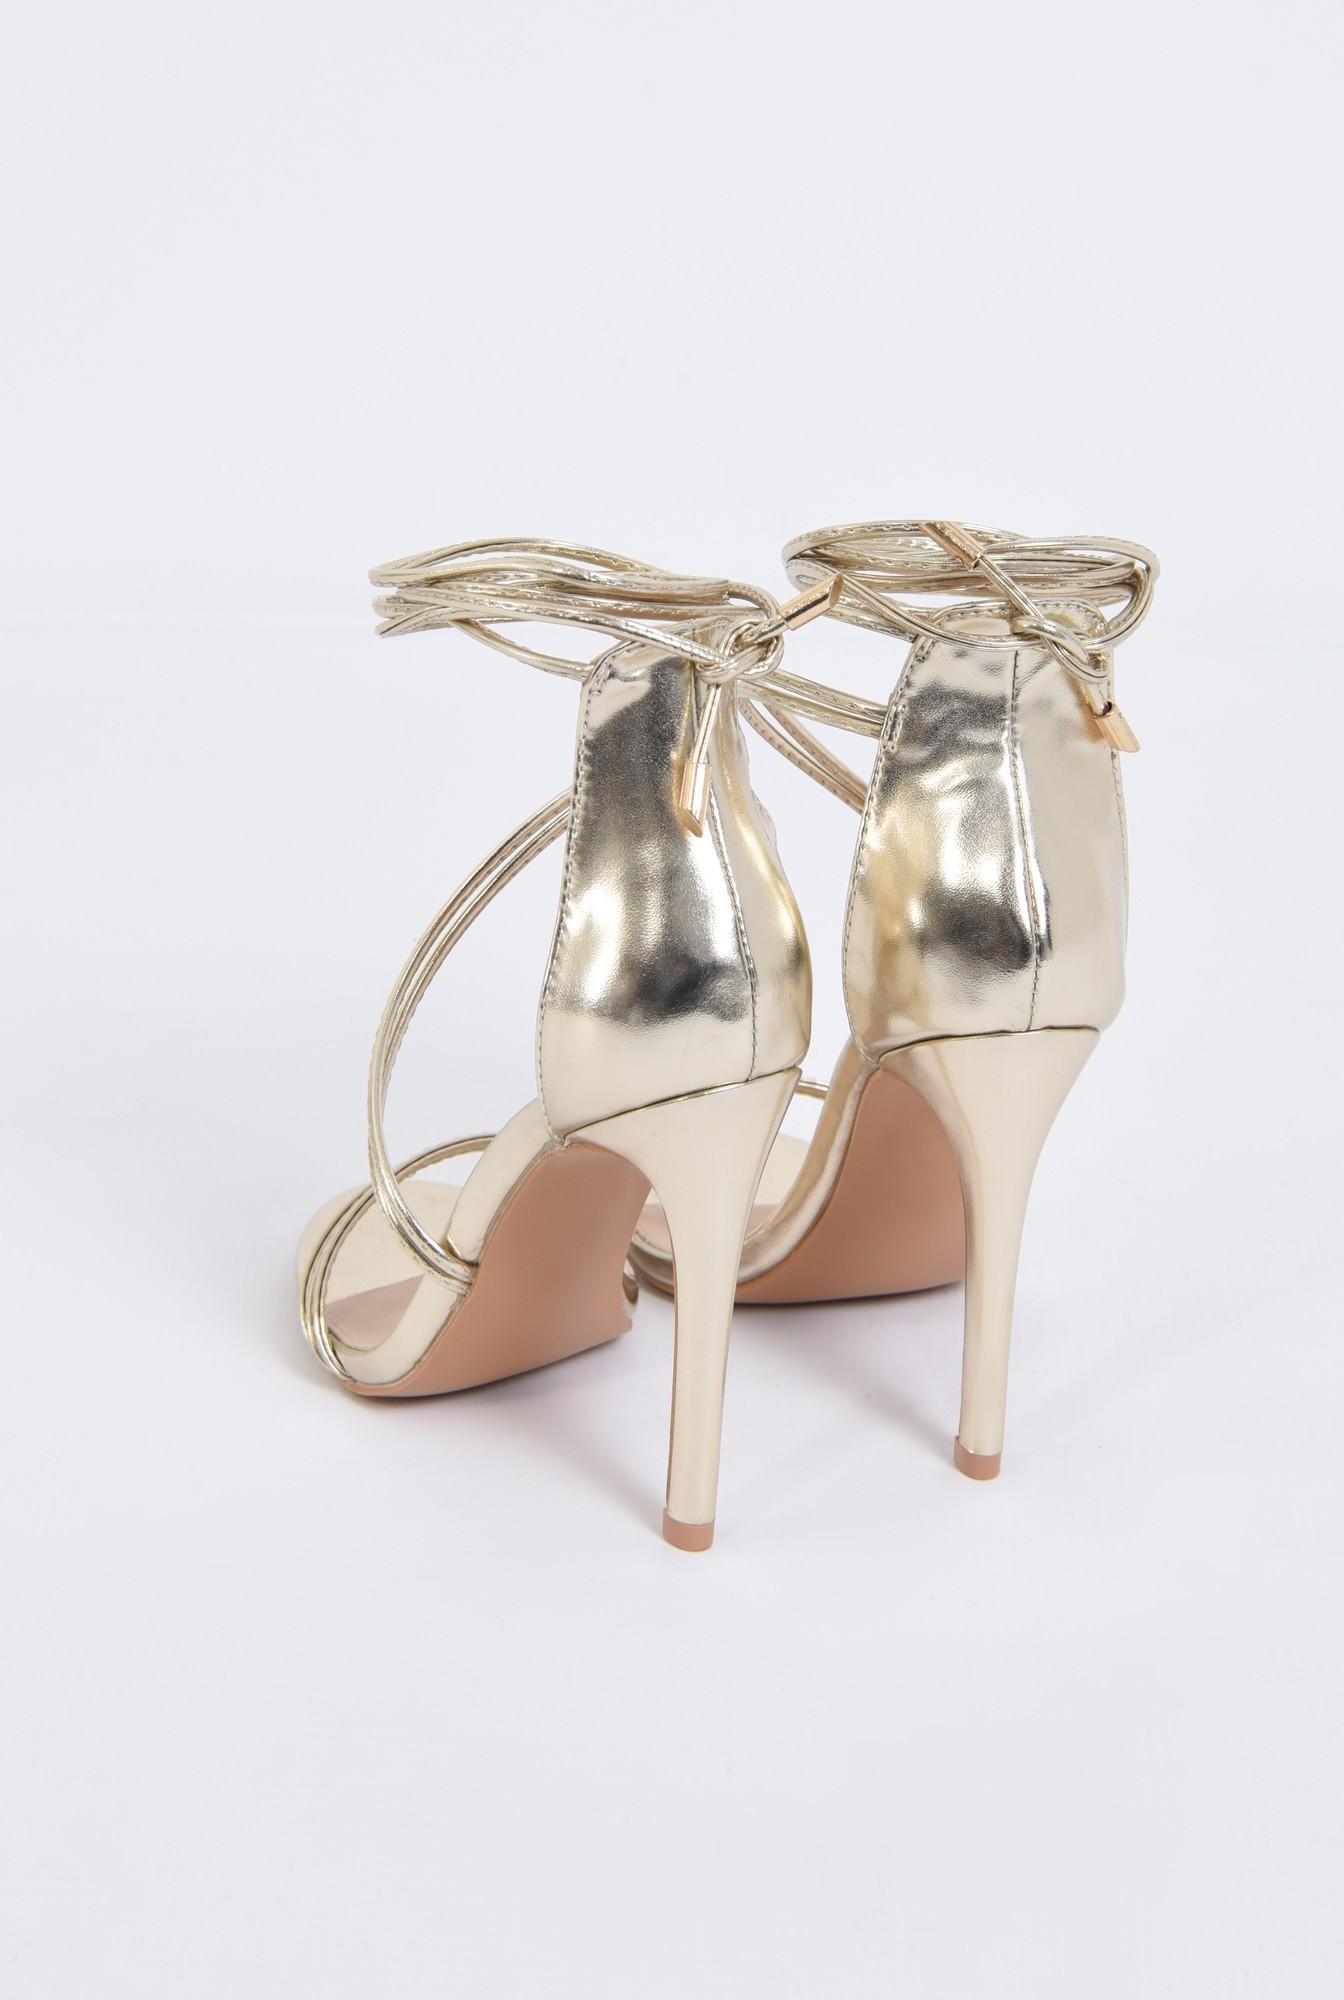 4 - sandale de seara, auriu, metalizat, barete